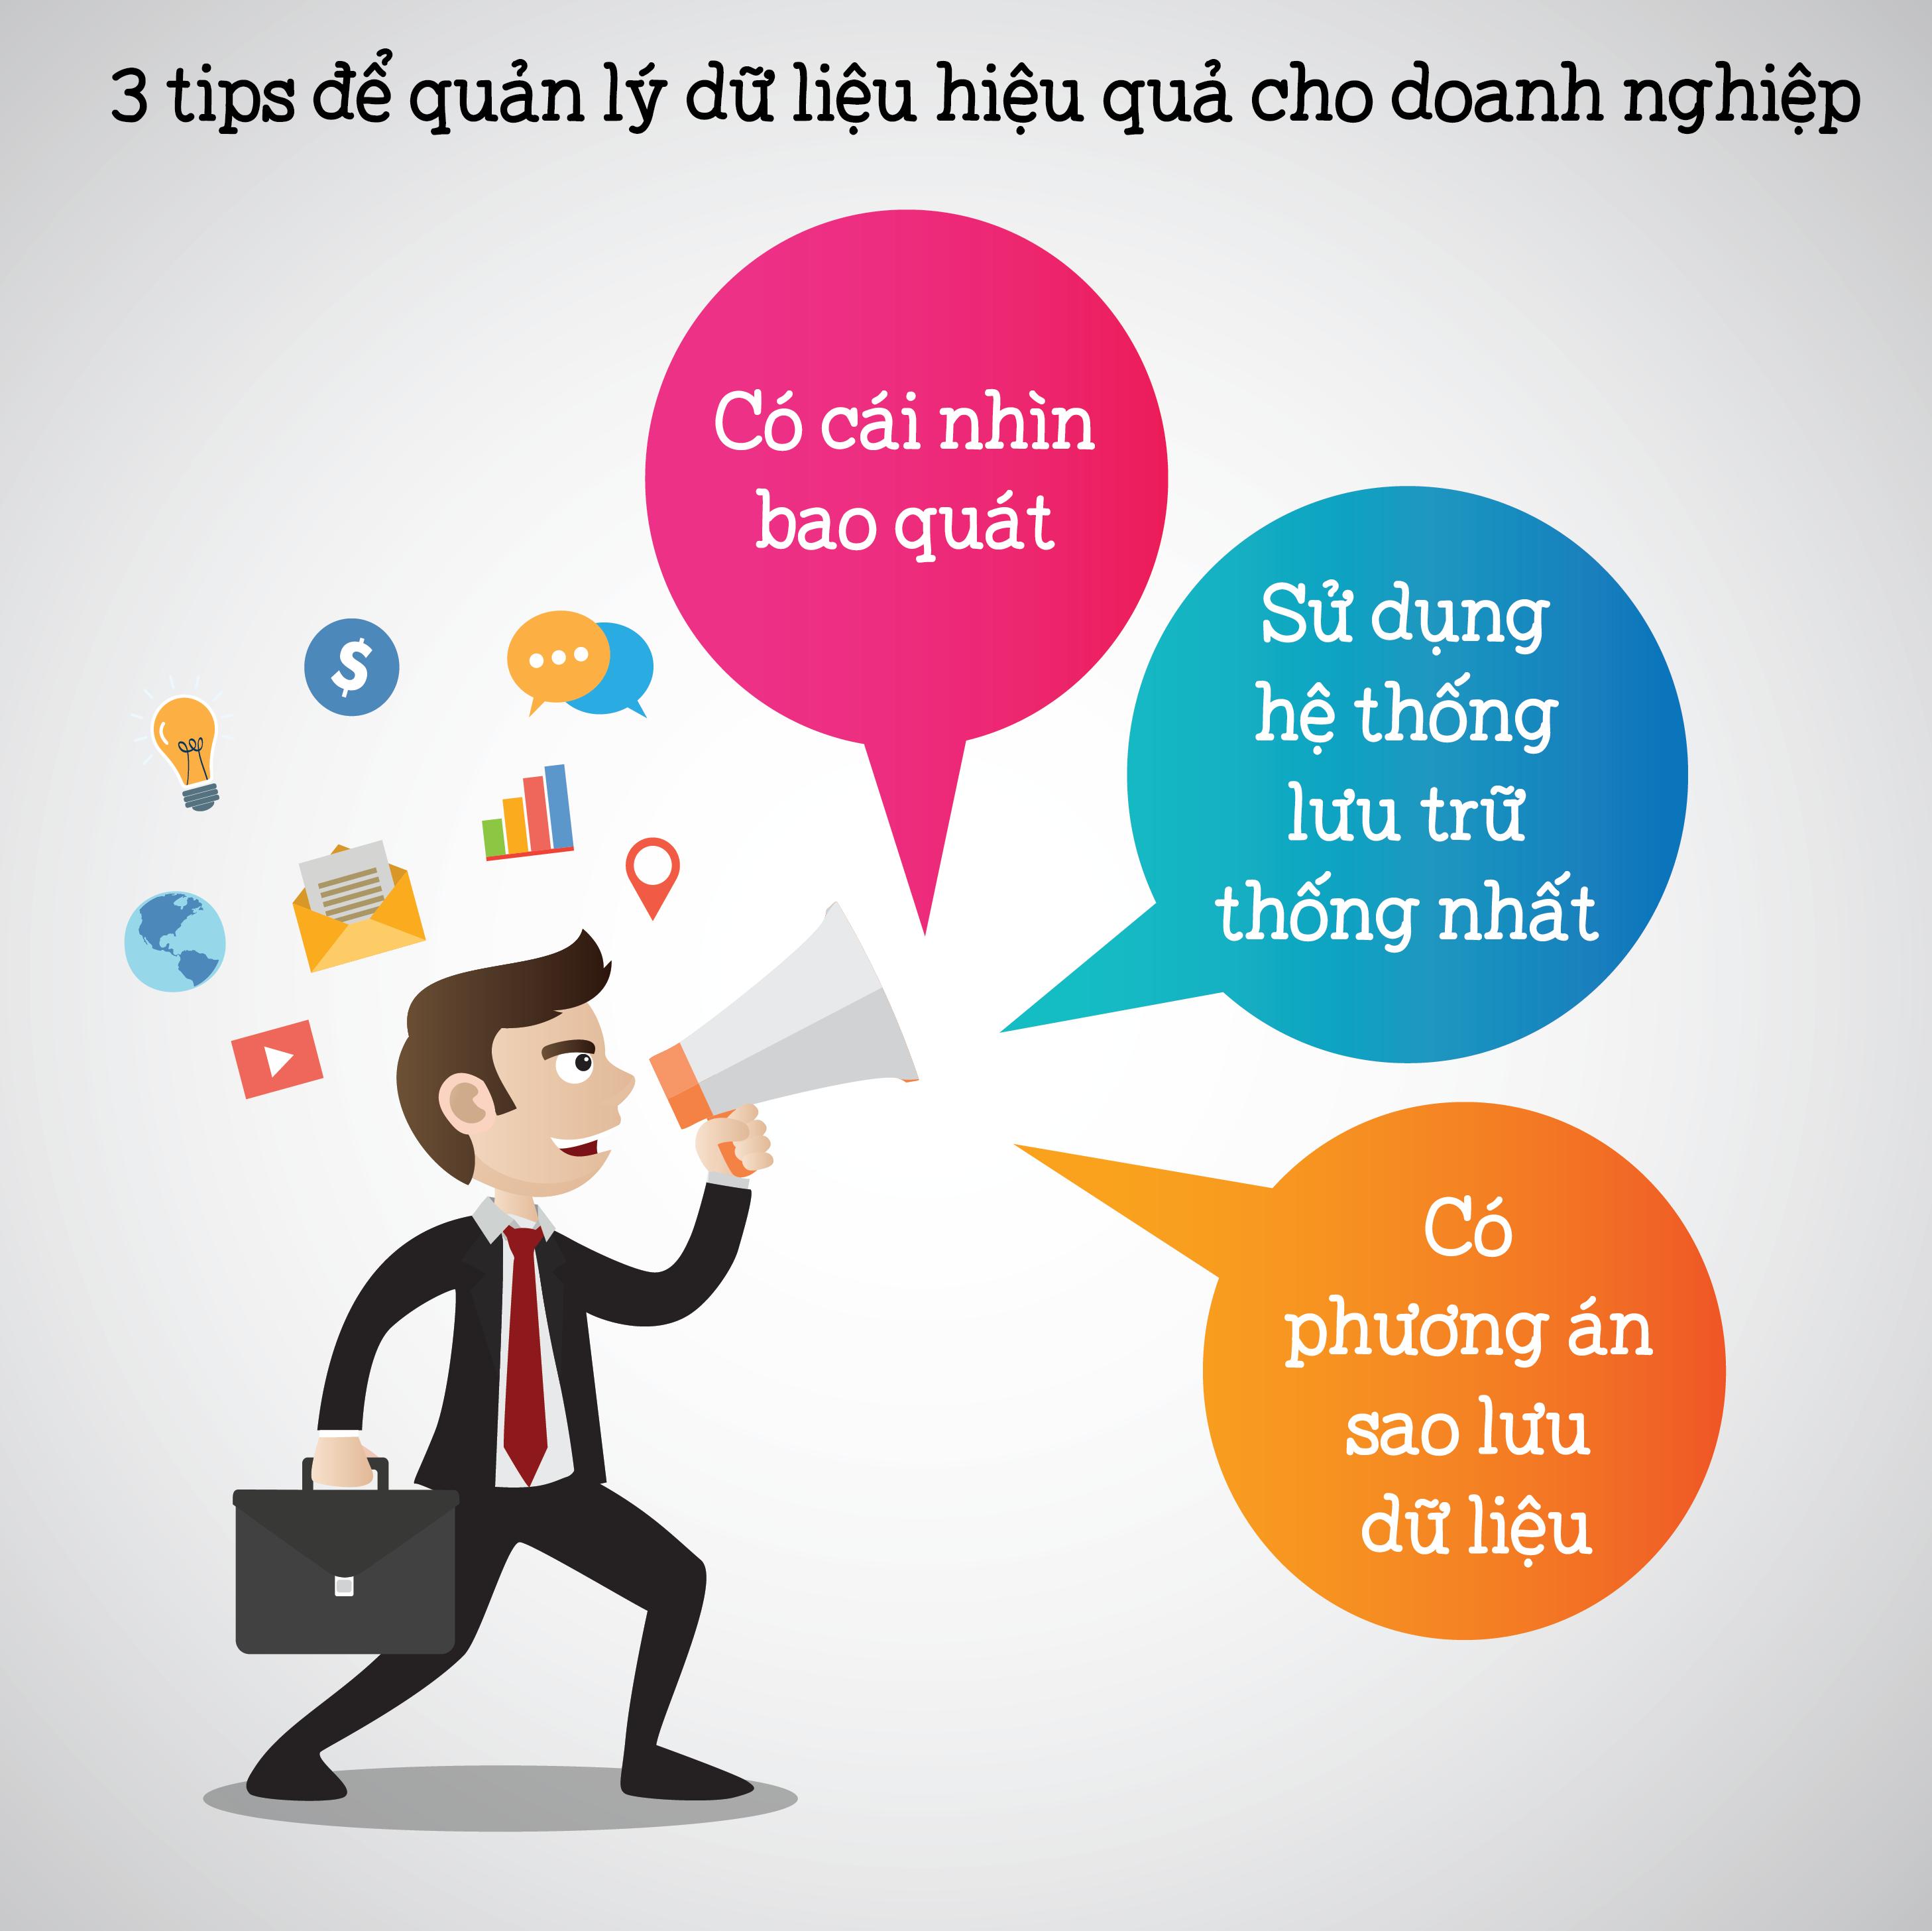 3-tips-de-quan-ly-du-lieu-hieu-qua-cho-doanh-nghiep